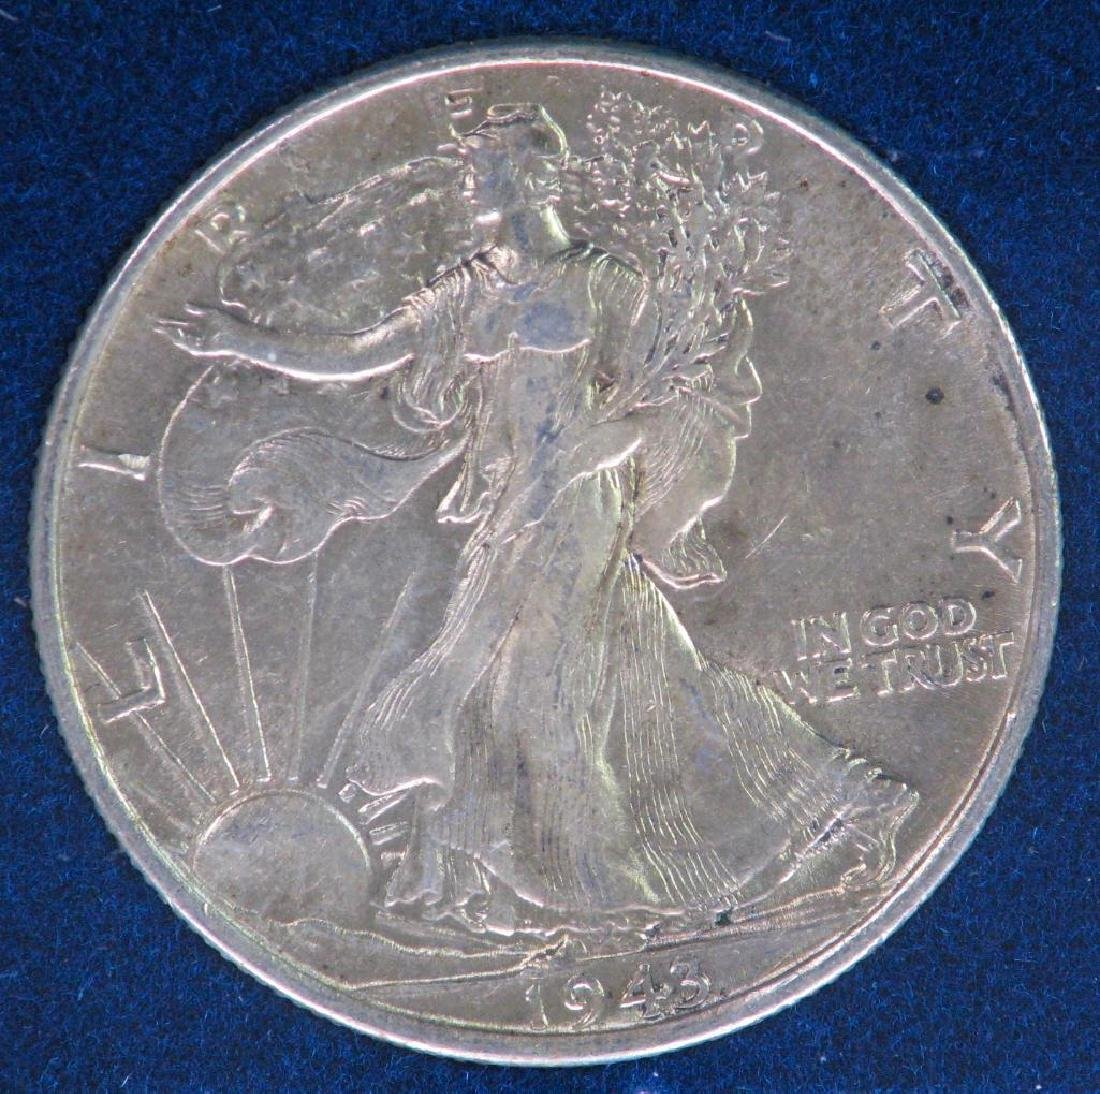 1943-P Walking Liberty Half Dollar - Uncirculated